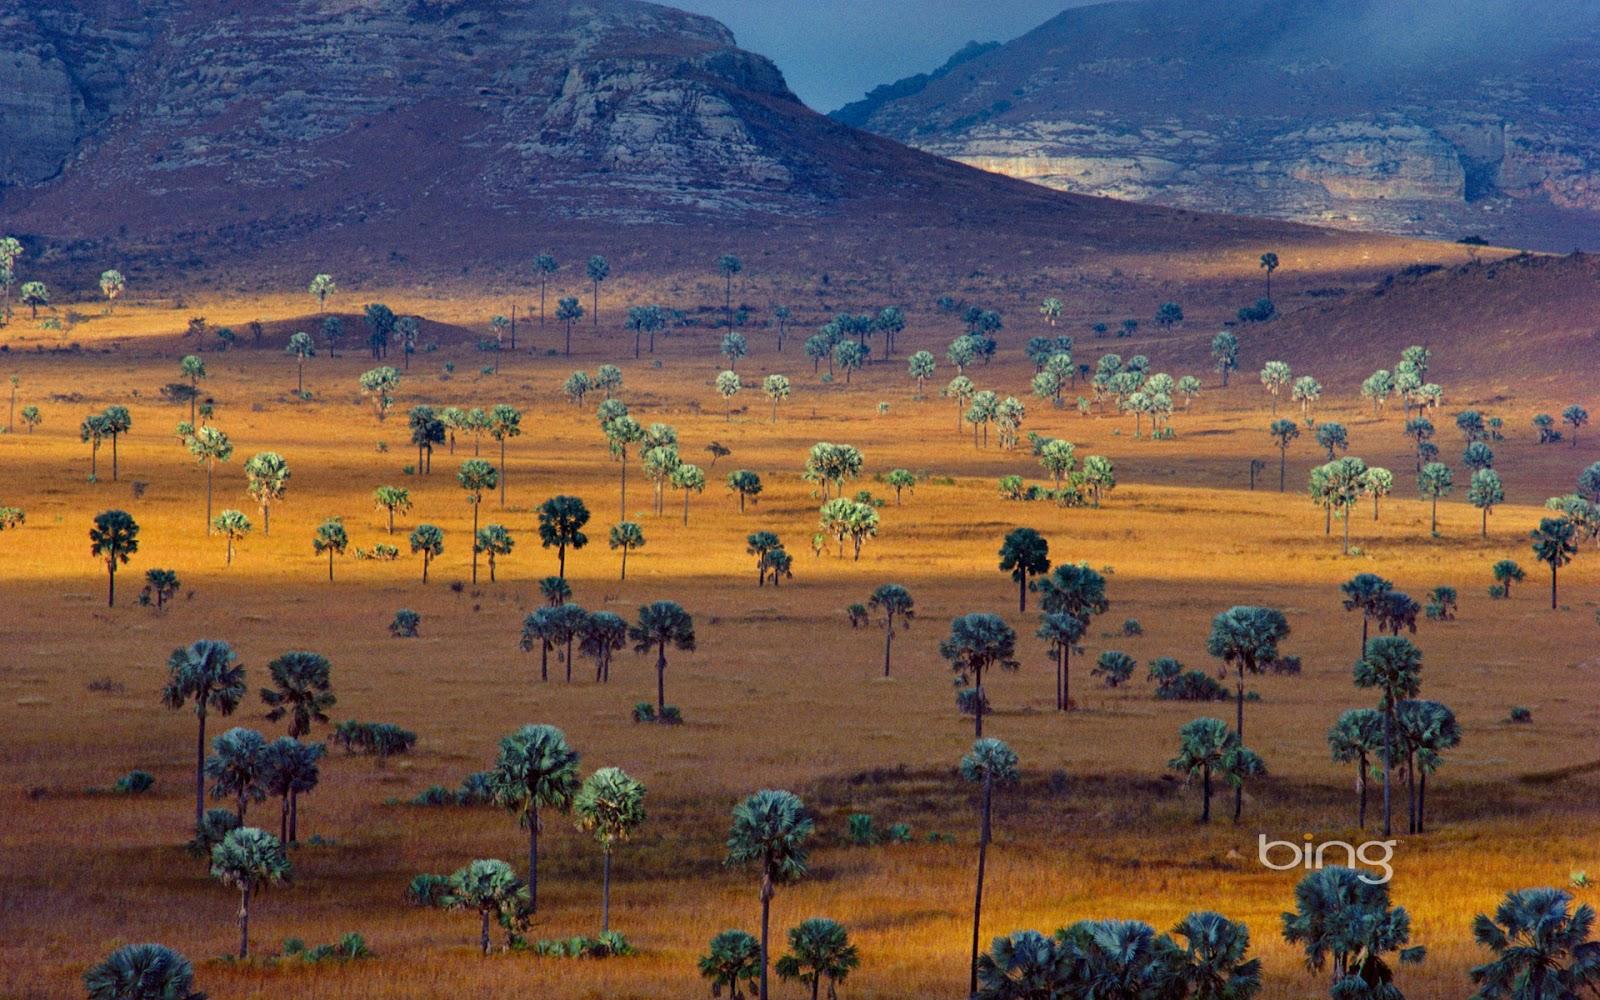 Plam trees growing on a savana Madagascar Frans LantingCorbis 1600x1000